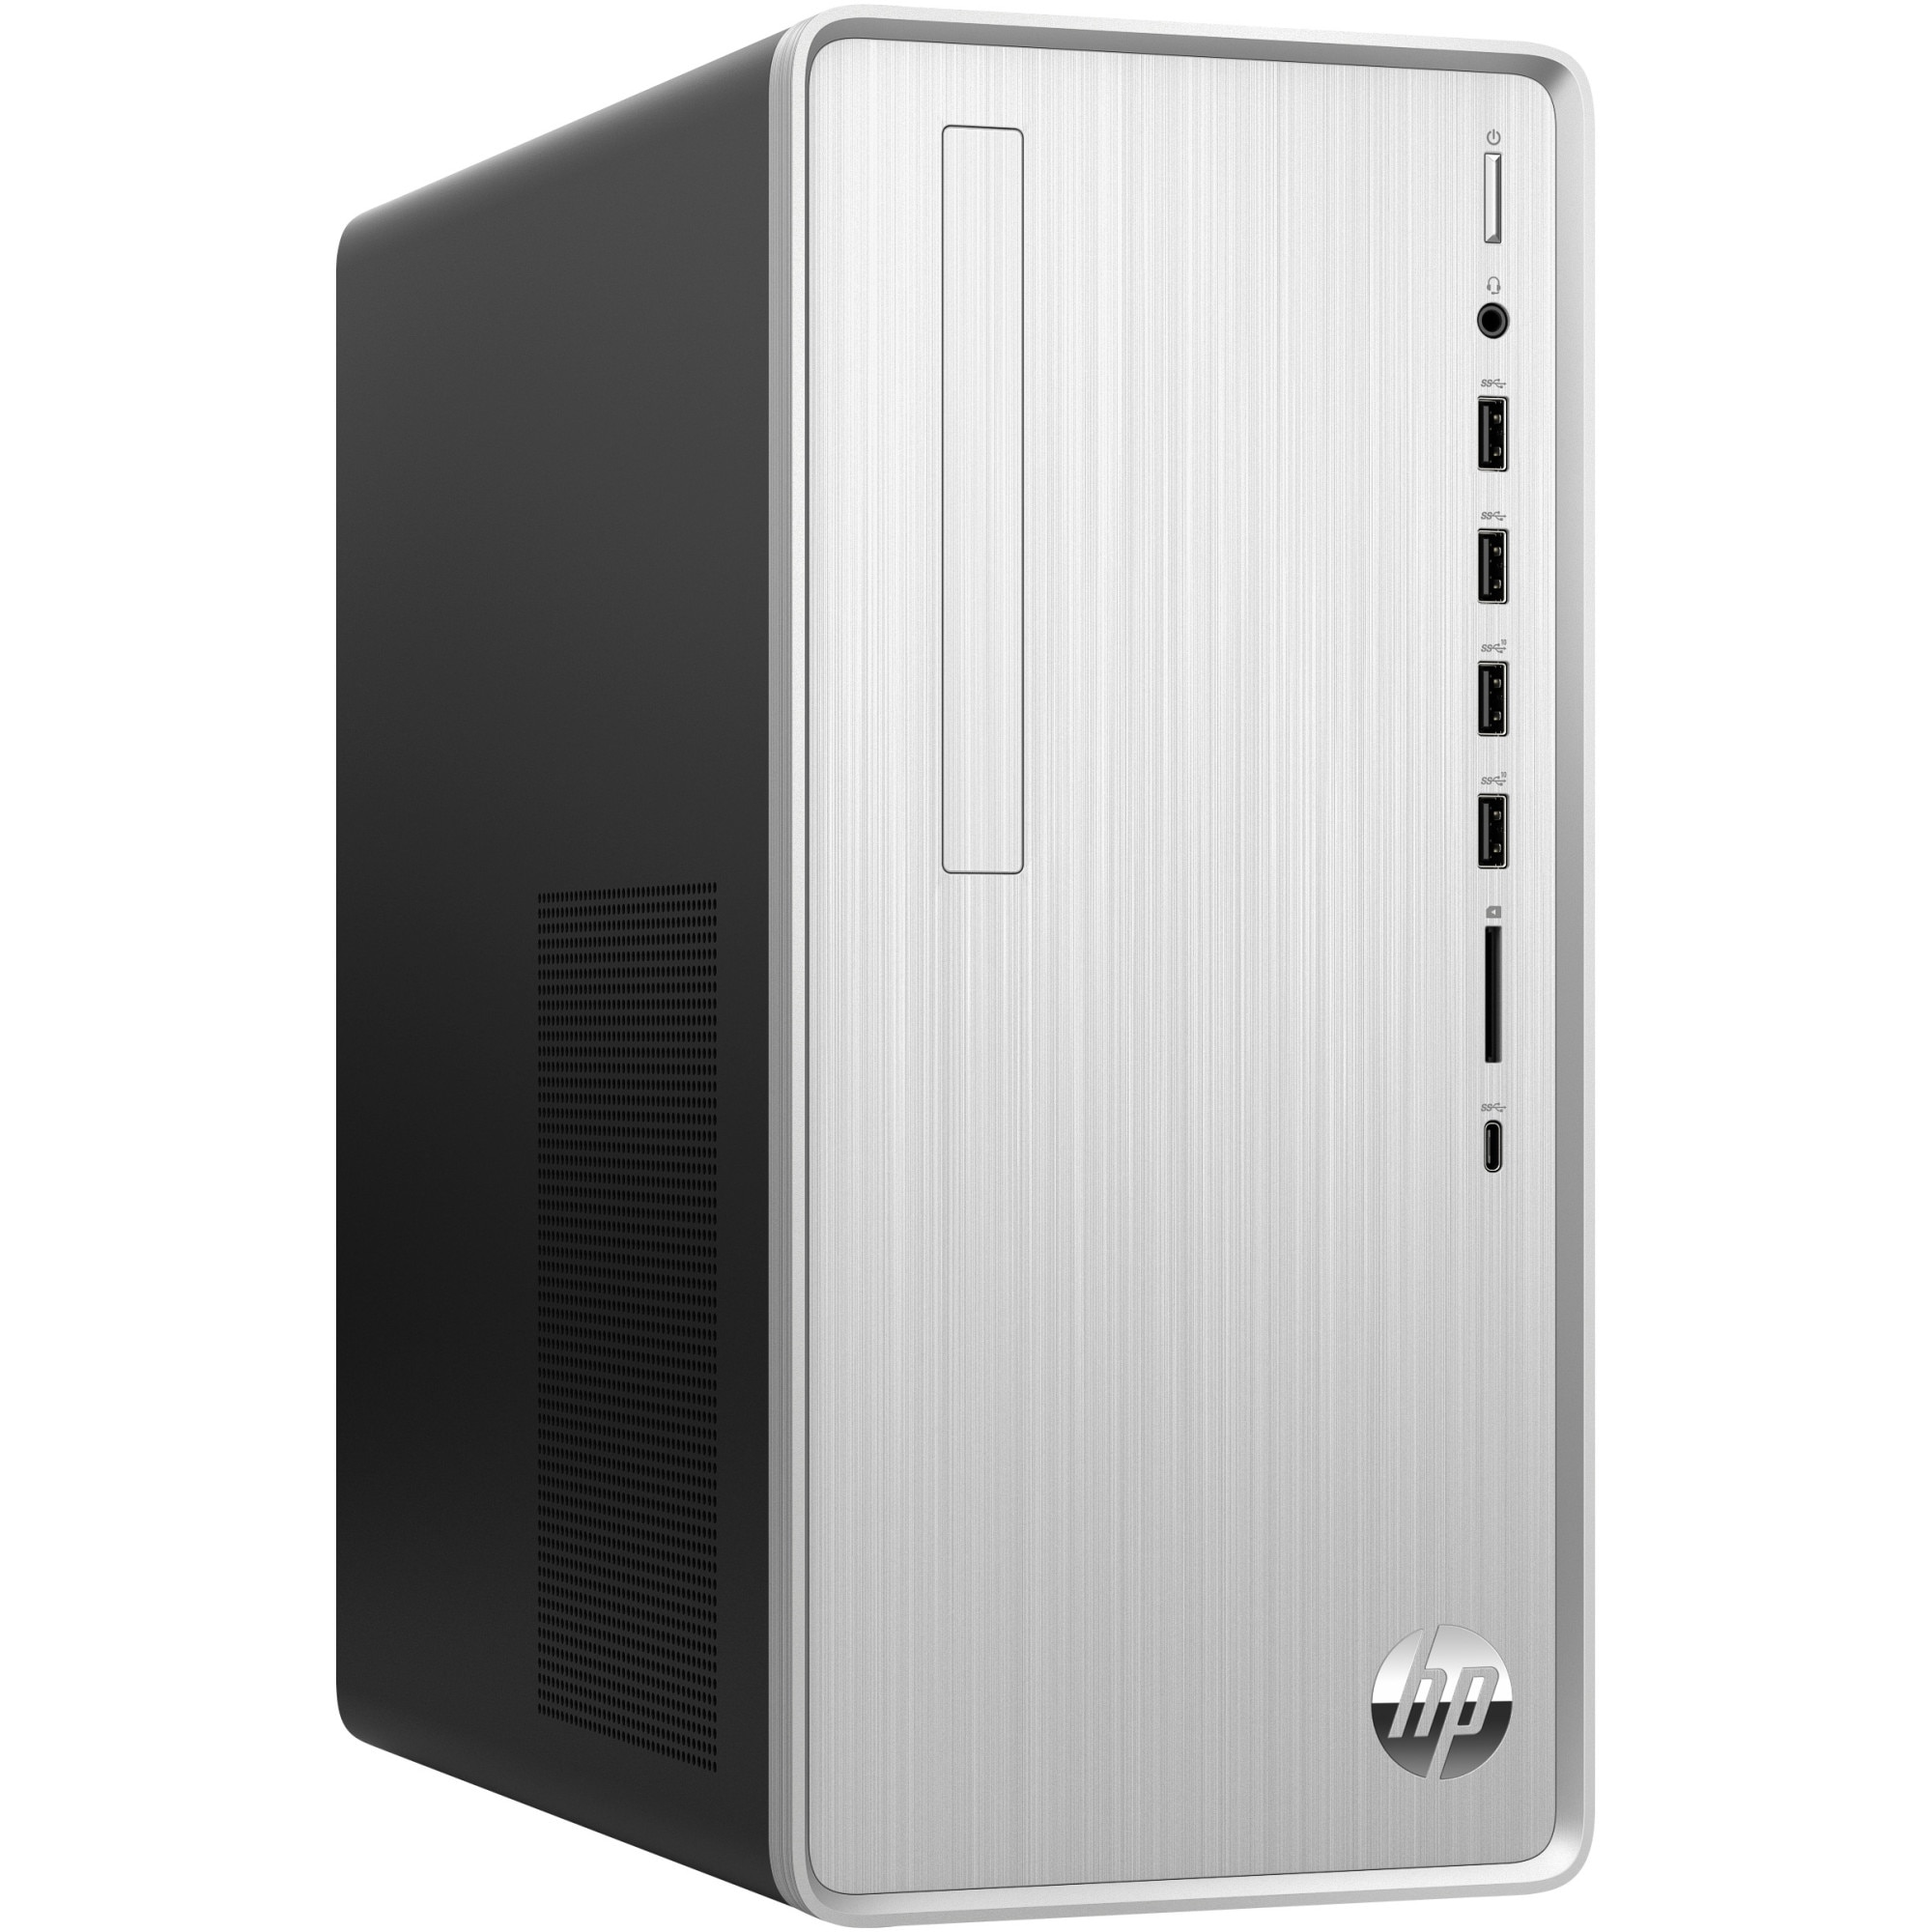 Fotografie Sistem Gaming HP Pavilion TP01-0001nq cu procesor AMD Ryzen™ 7-3700X pana la 4.40 GHz, 16GB DDR4, 512GB SSD, NVIDIA GeForce GTX 1660 SUPER 6GB, Free DOS